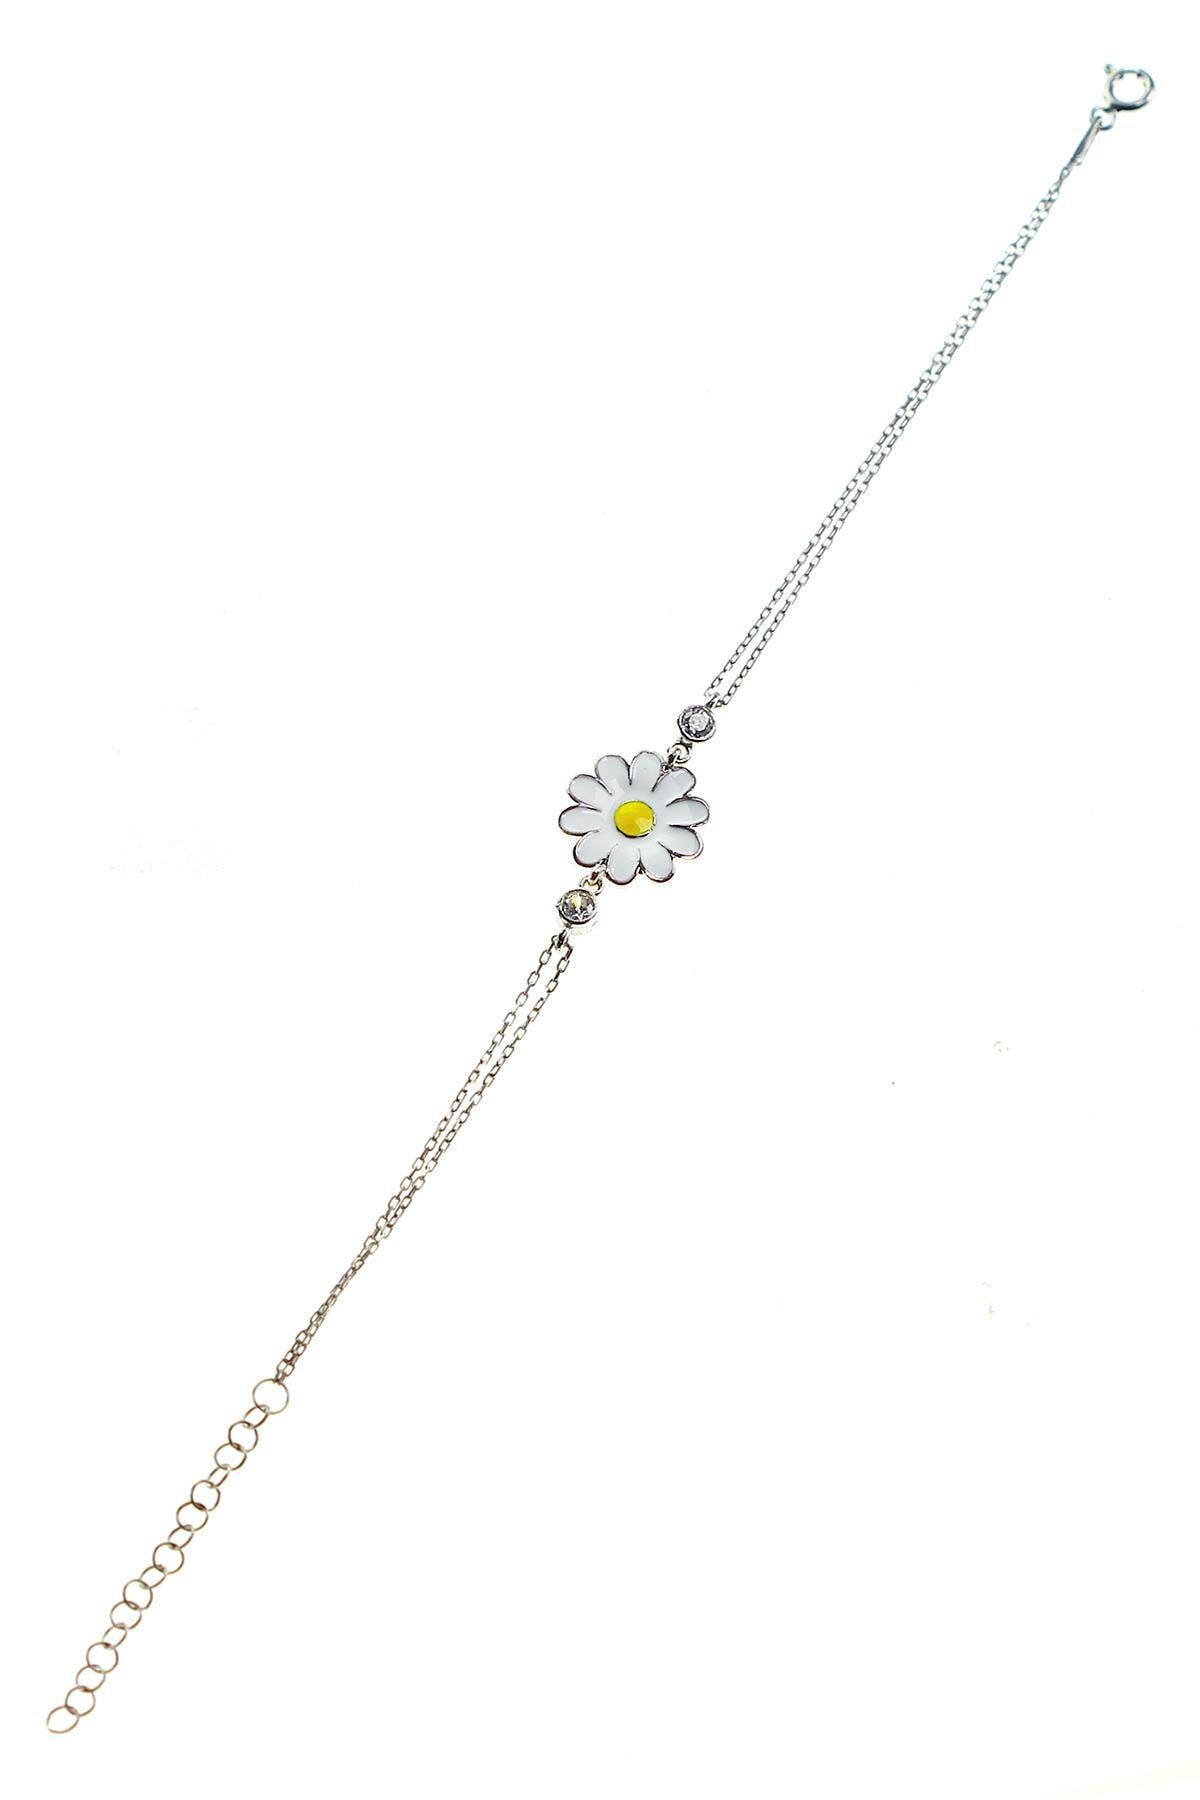 Söğütlü Silver Gümüş rodyumlu mineli papatya kolye bileklik ve küpe gümüş set 2